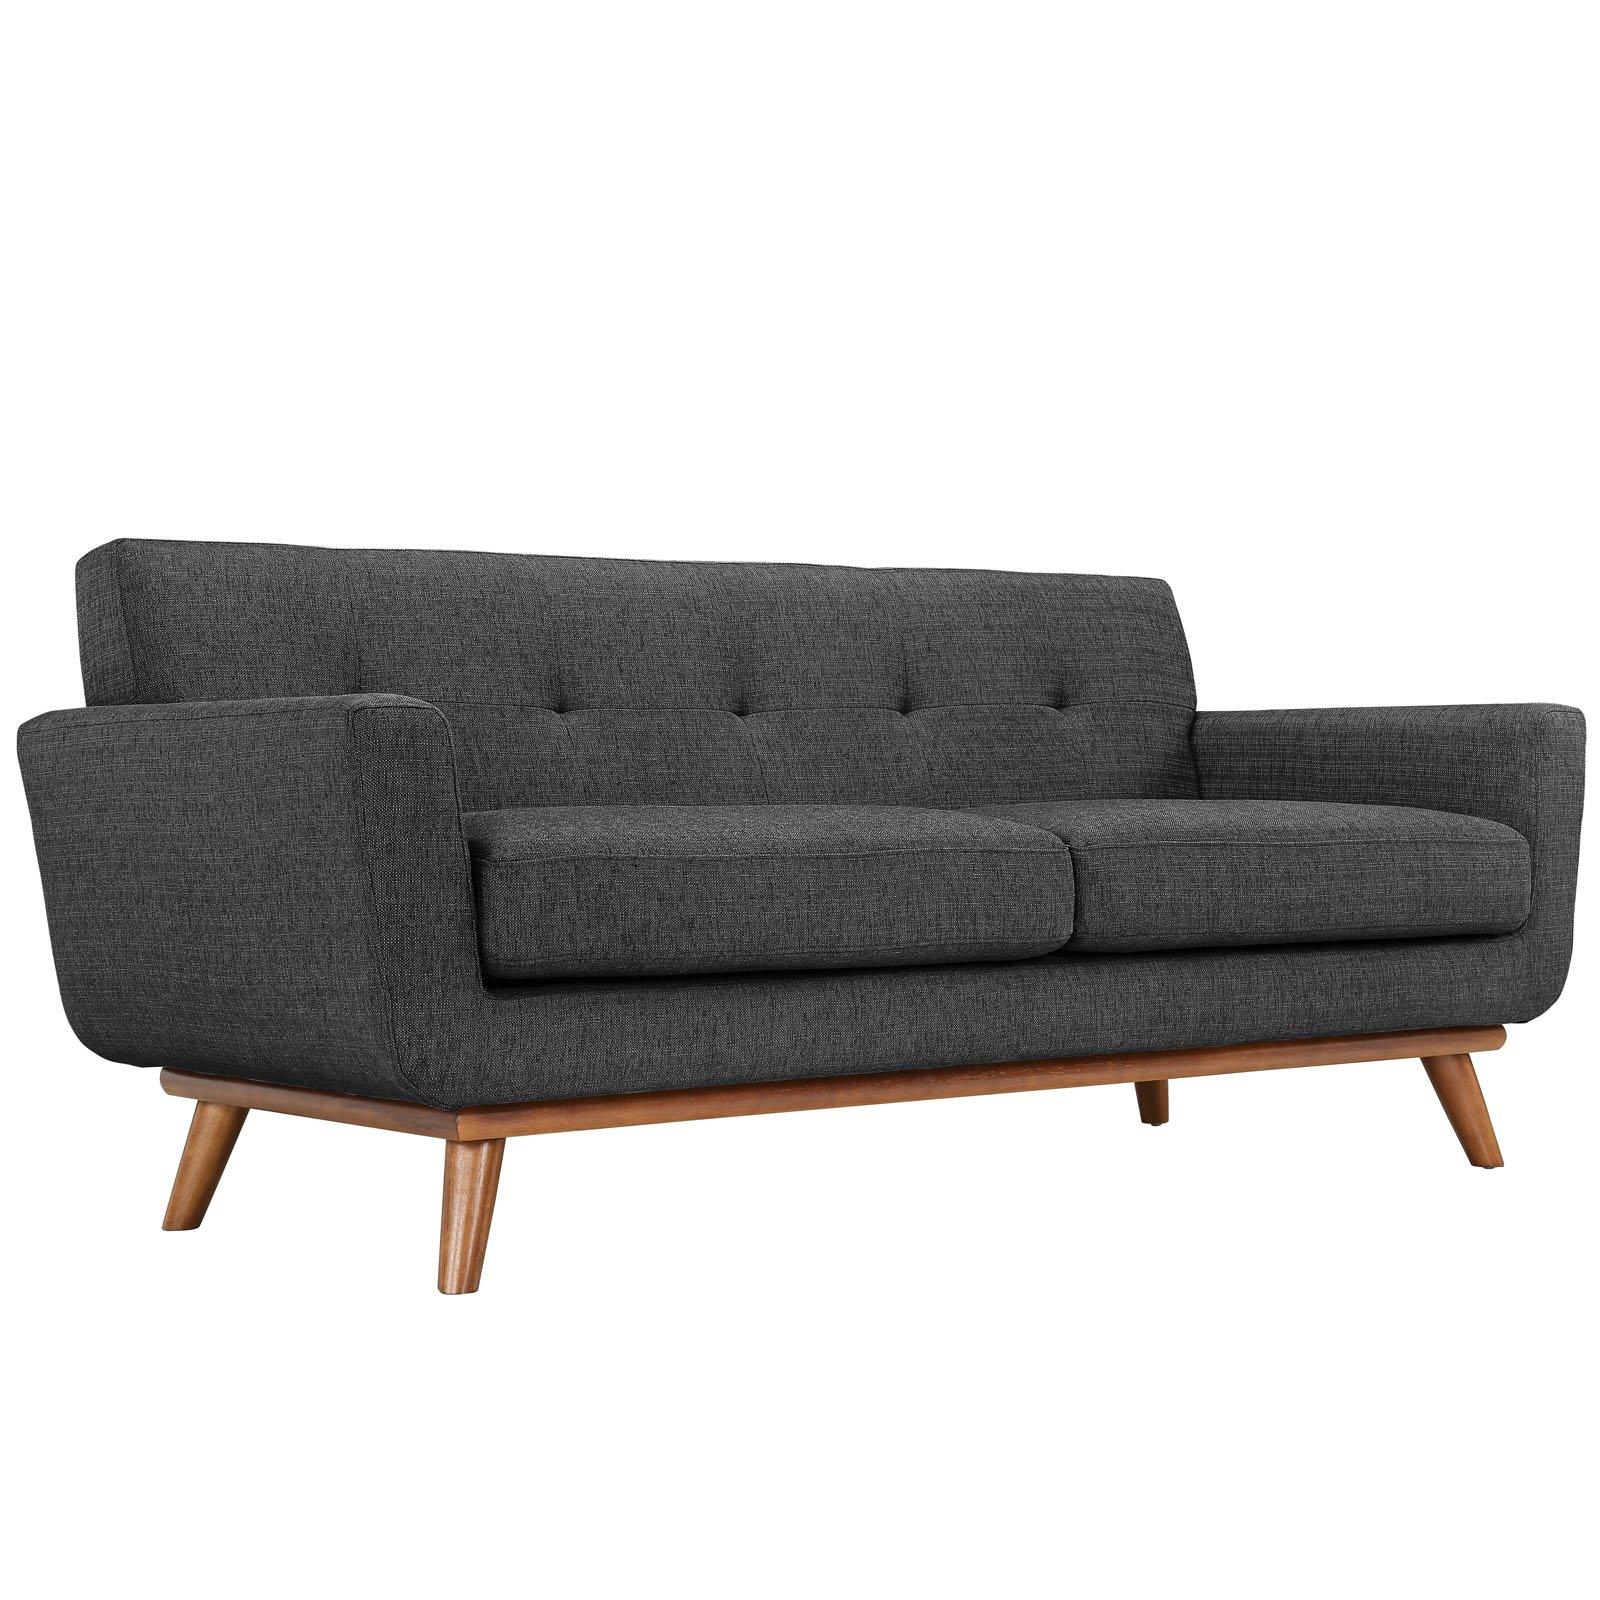 The Best Sleeper Sofa Under $500 of 2020 - [Trendy Designs ...